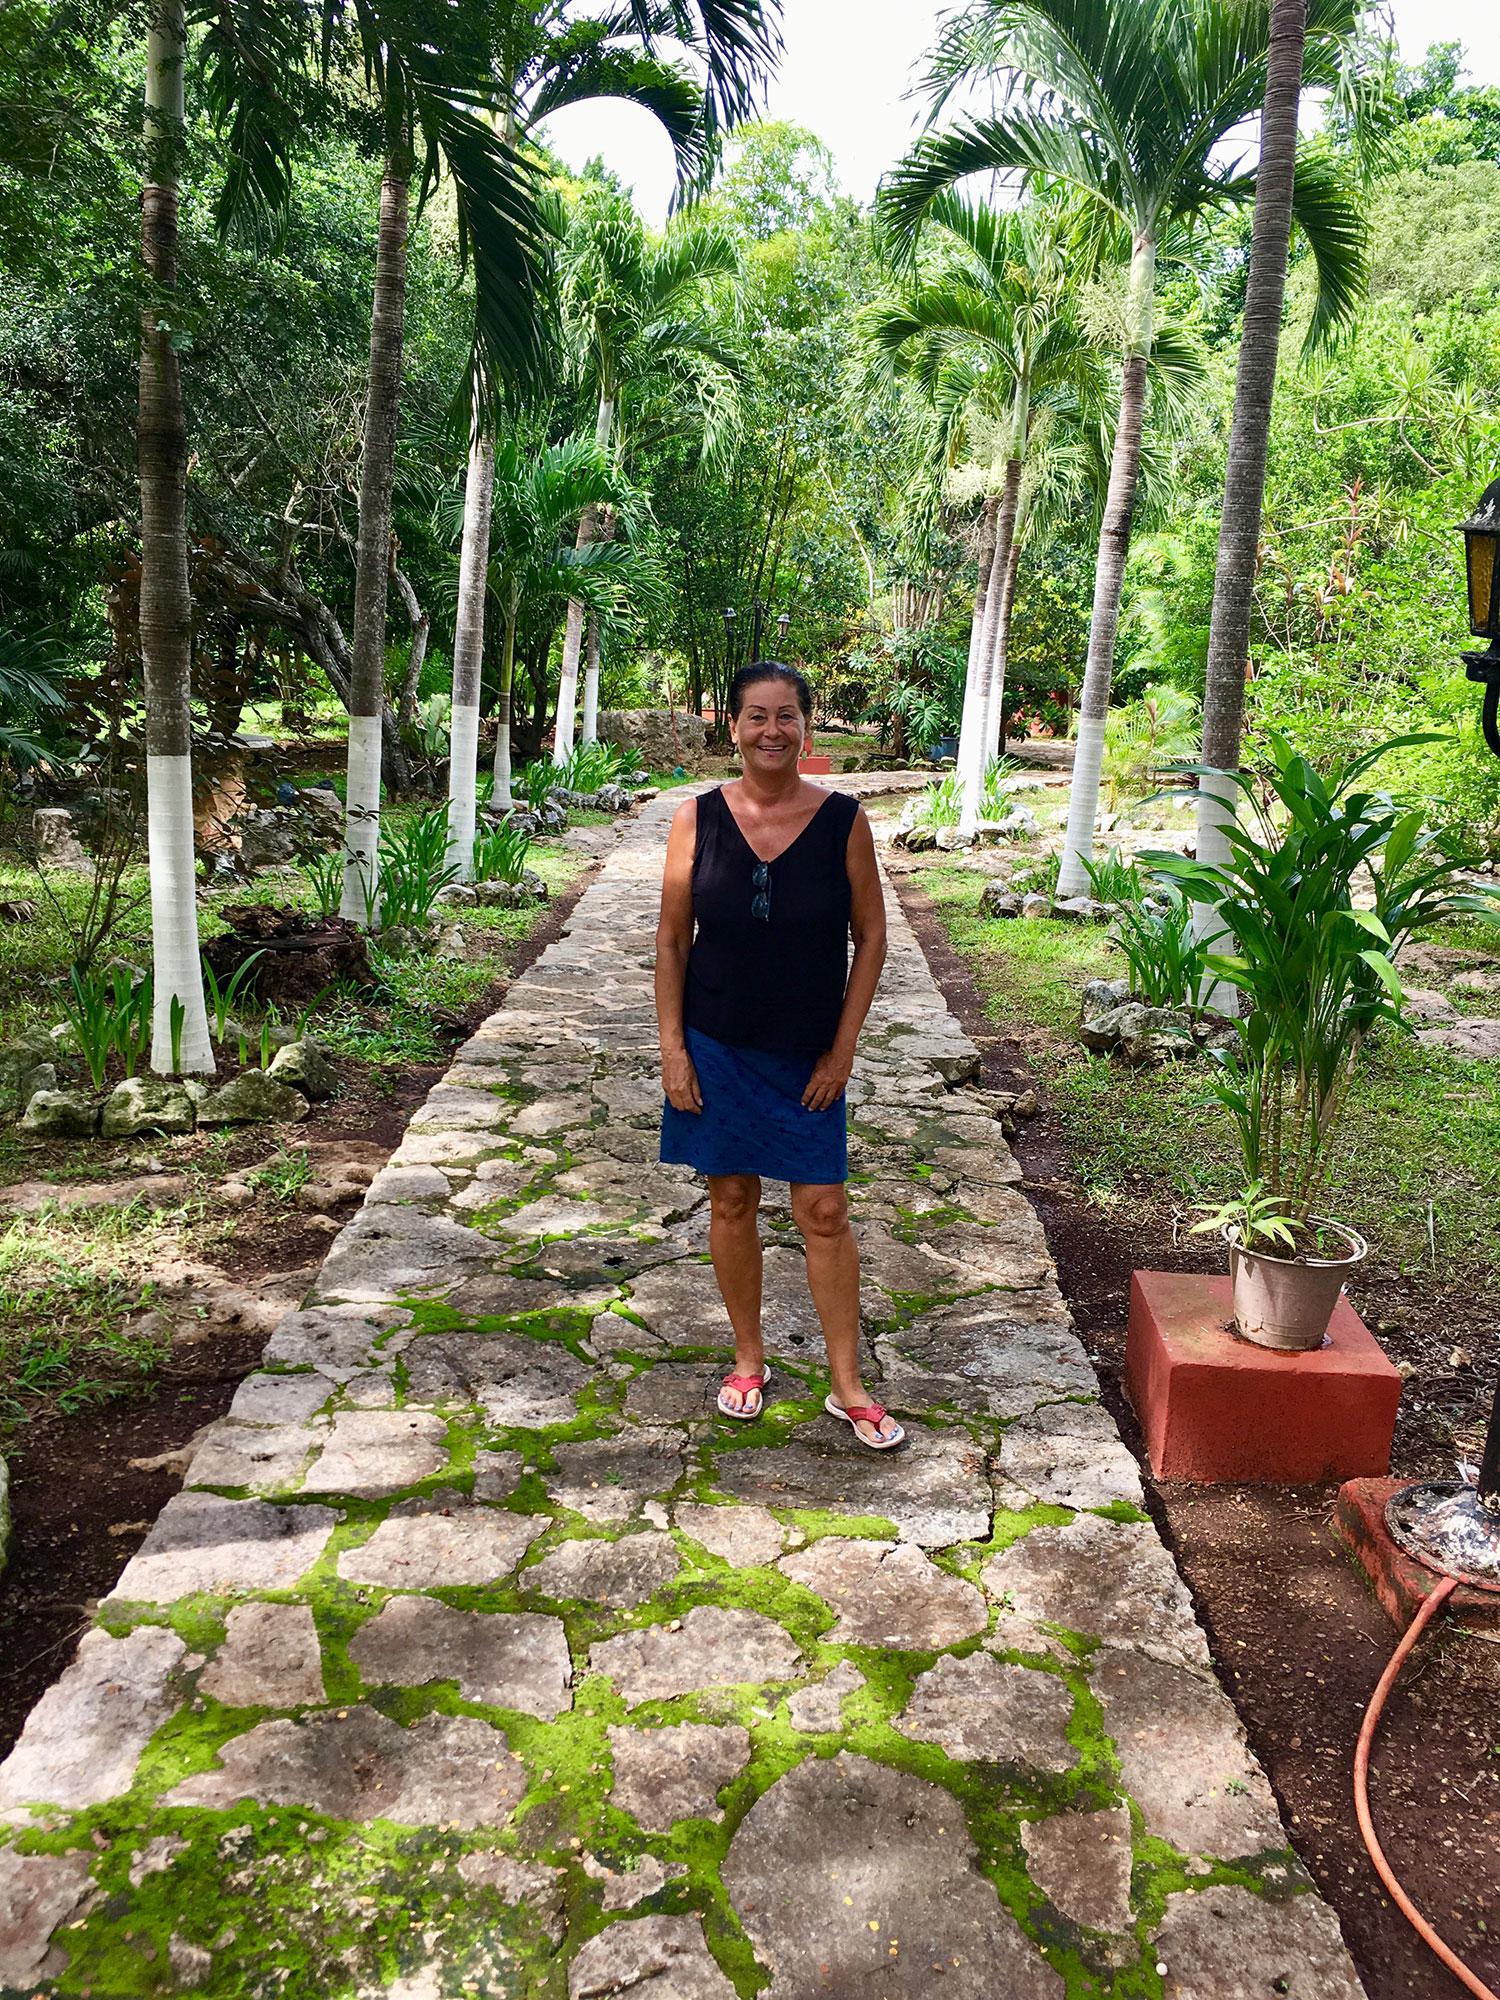 Hammocks_and_Ruins_What_to_Do_Mexico_Mayan_pyramid_cenote_hacienda_Yucatan_Ticuch_25.jpg